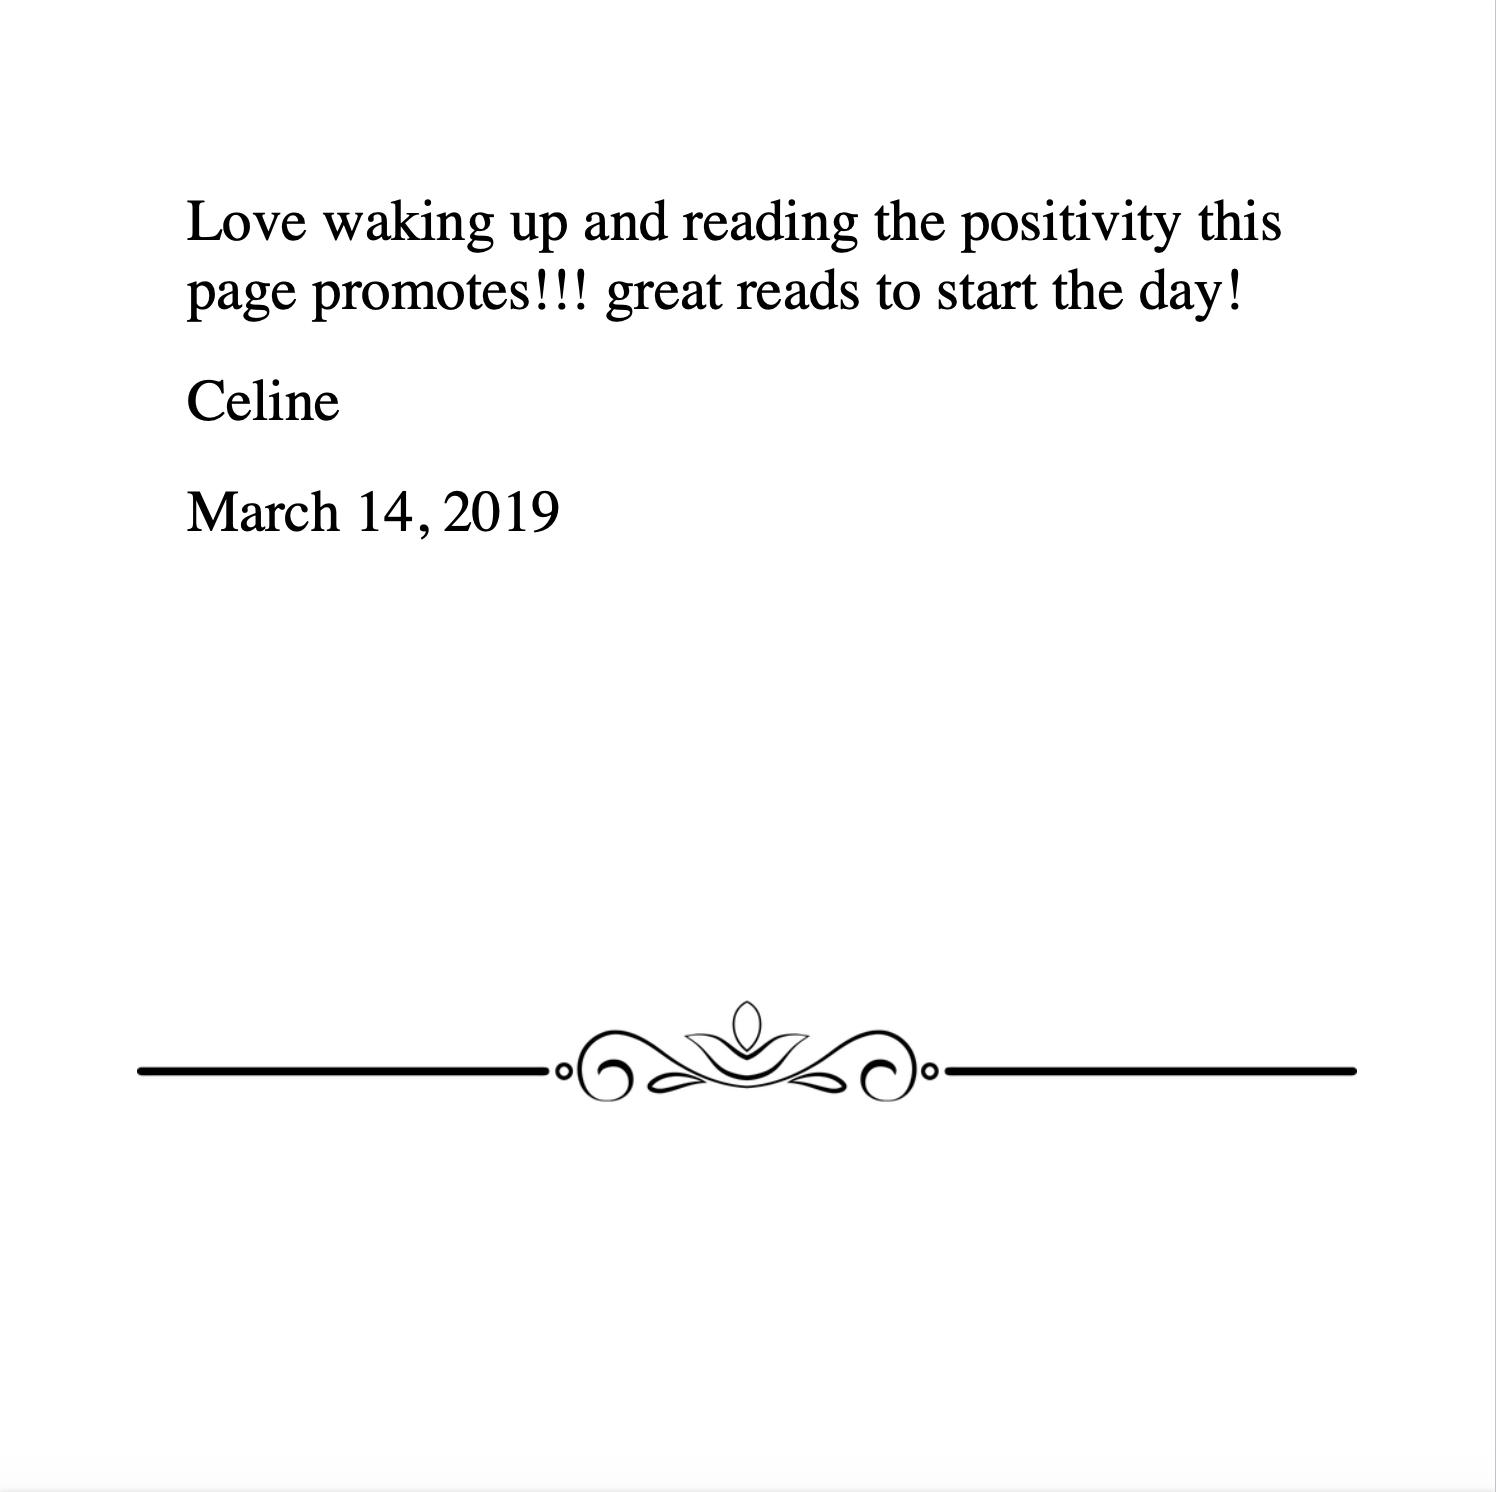 Celine 3.14.2019